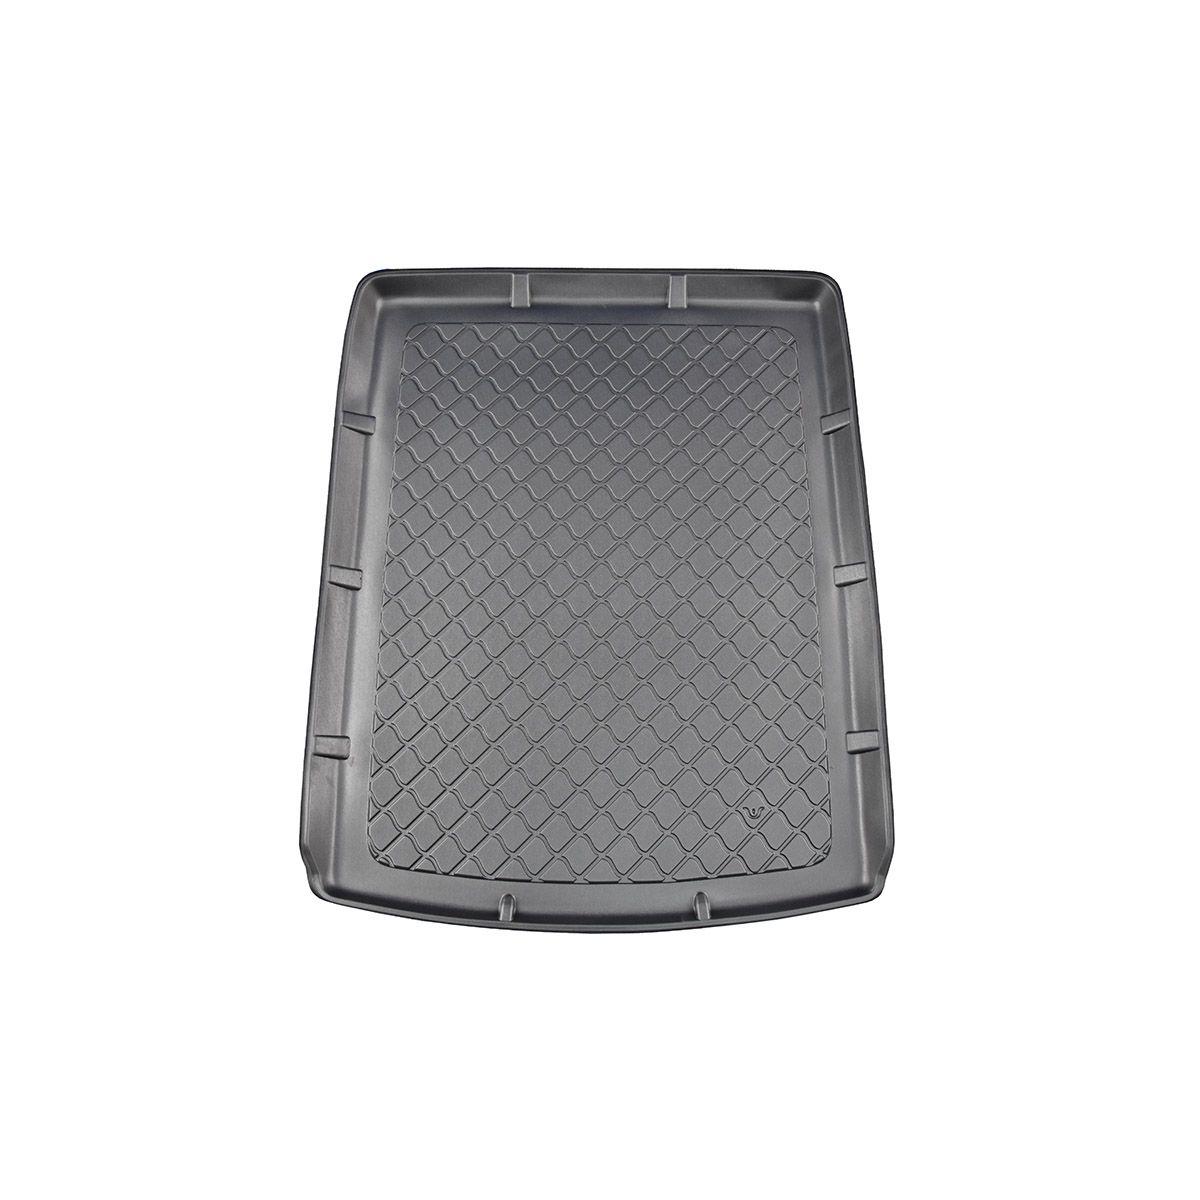 Audi A6 / S6 / RS6 Avant (C7; 2011 - 2018) Moulded Boot Mat product image